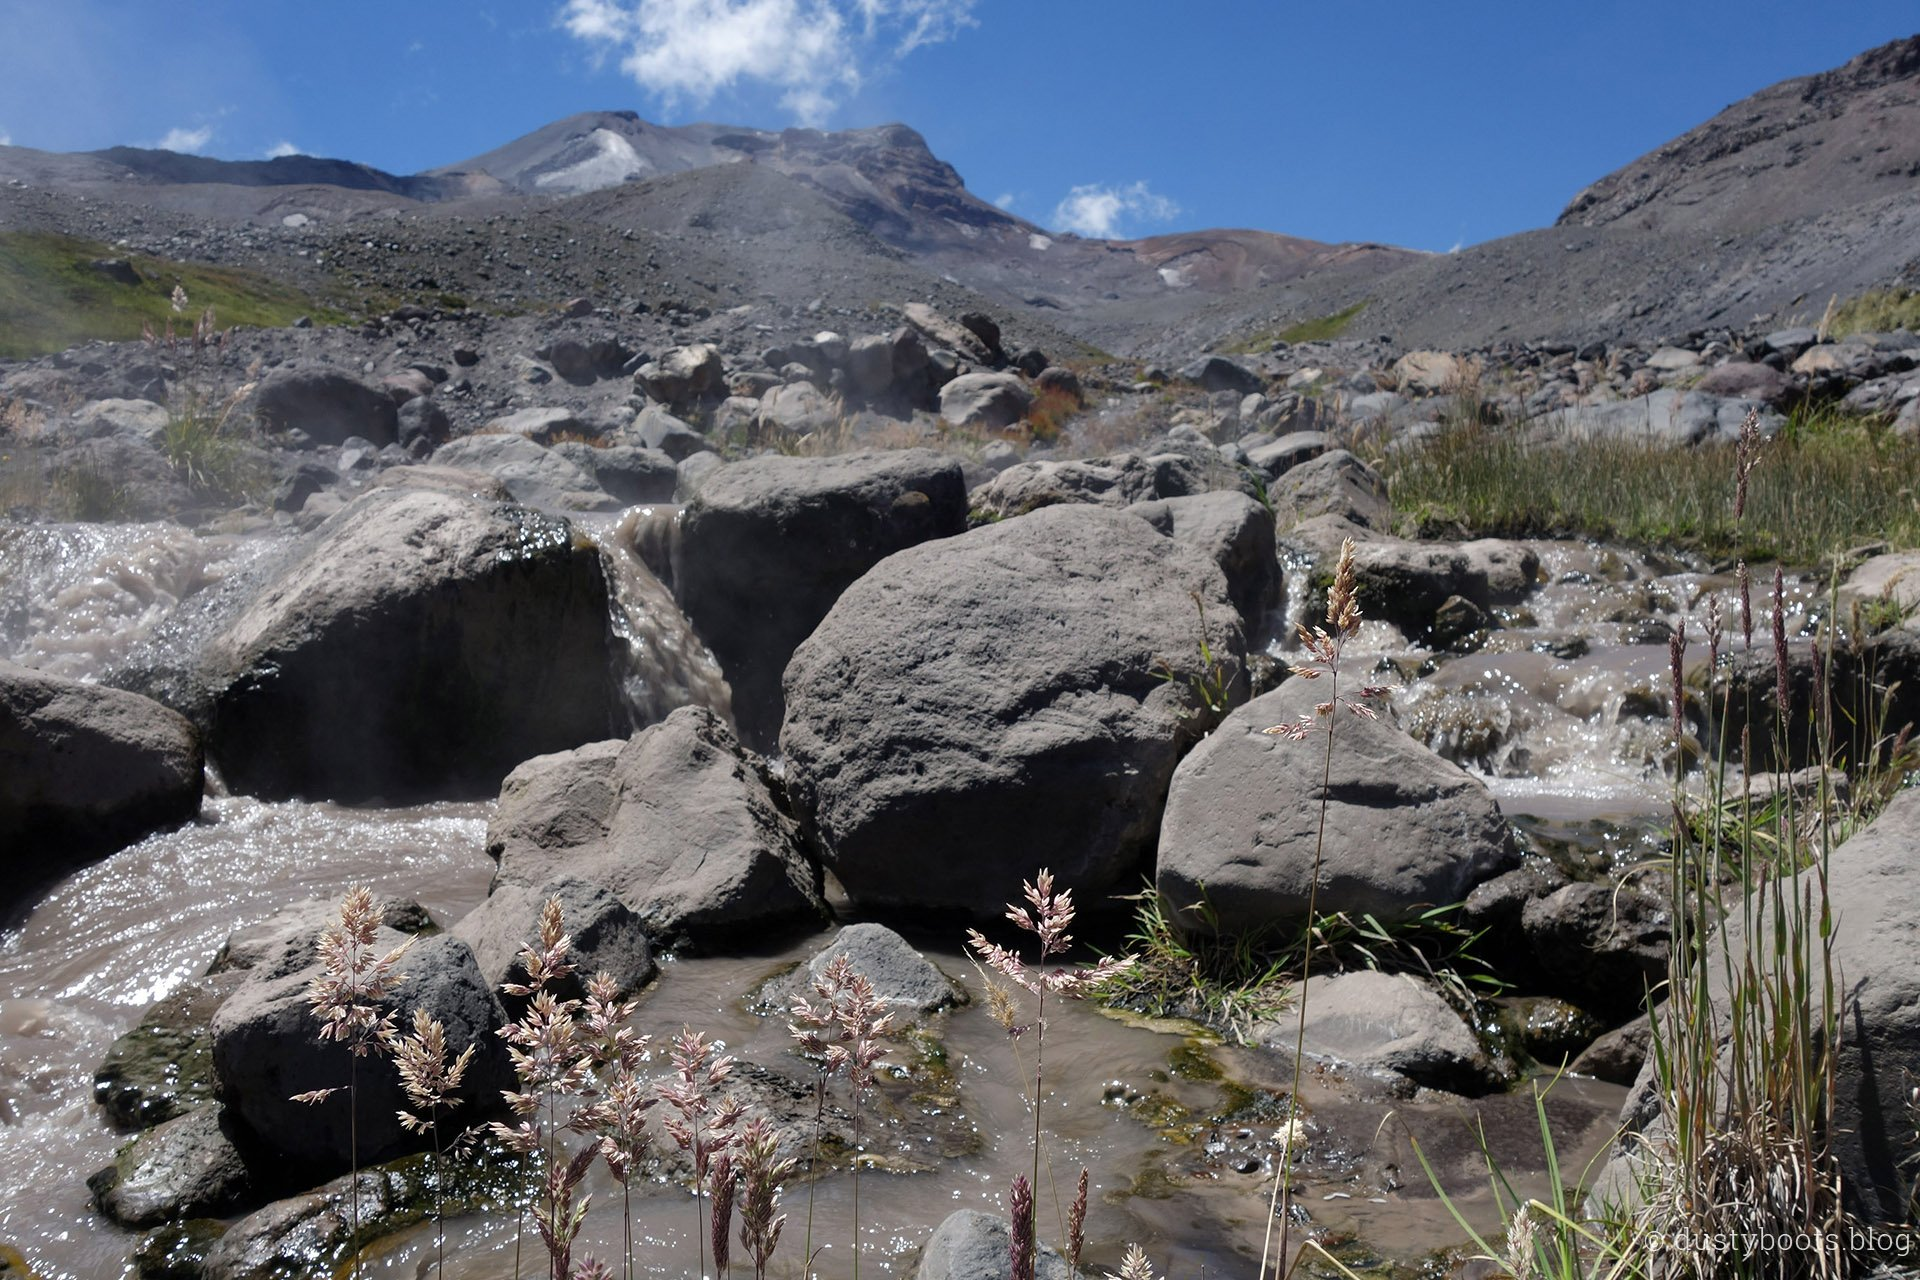 heißer Fluss im Valle de Aguas Calientes in Chile